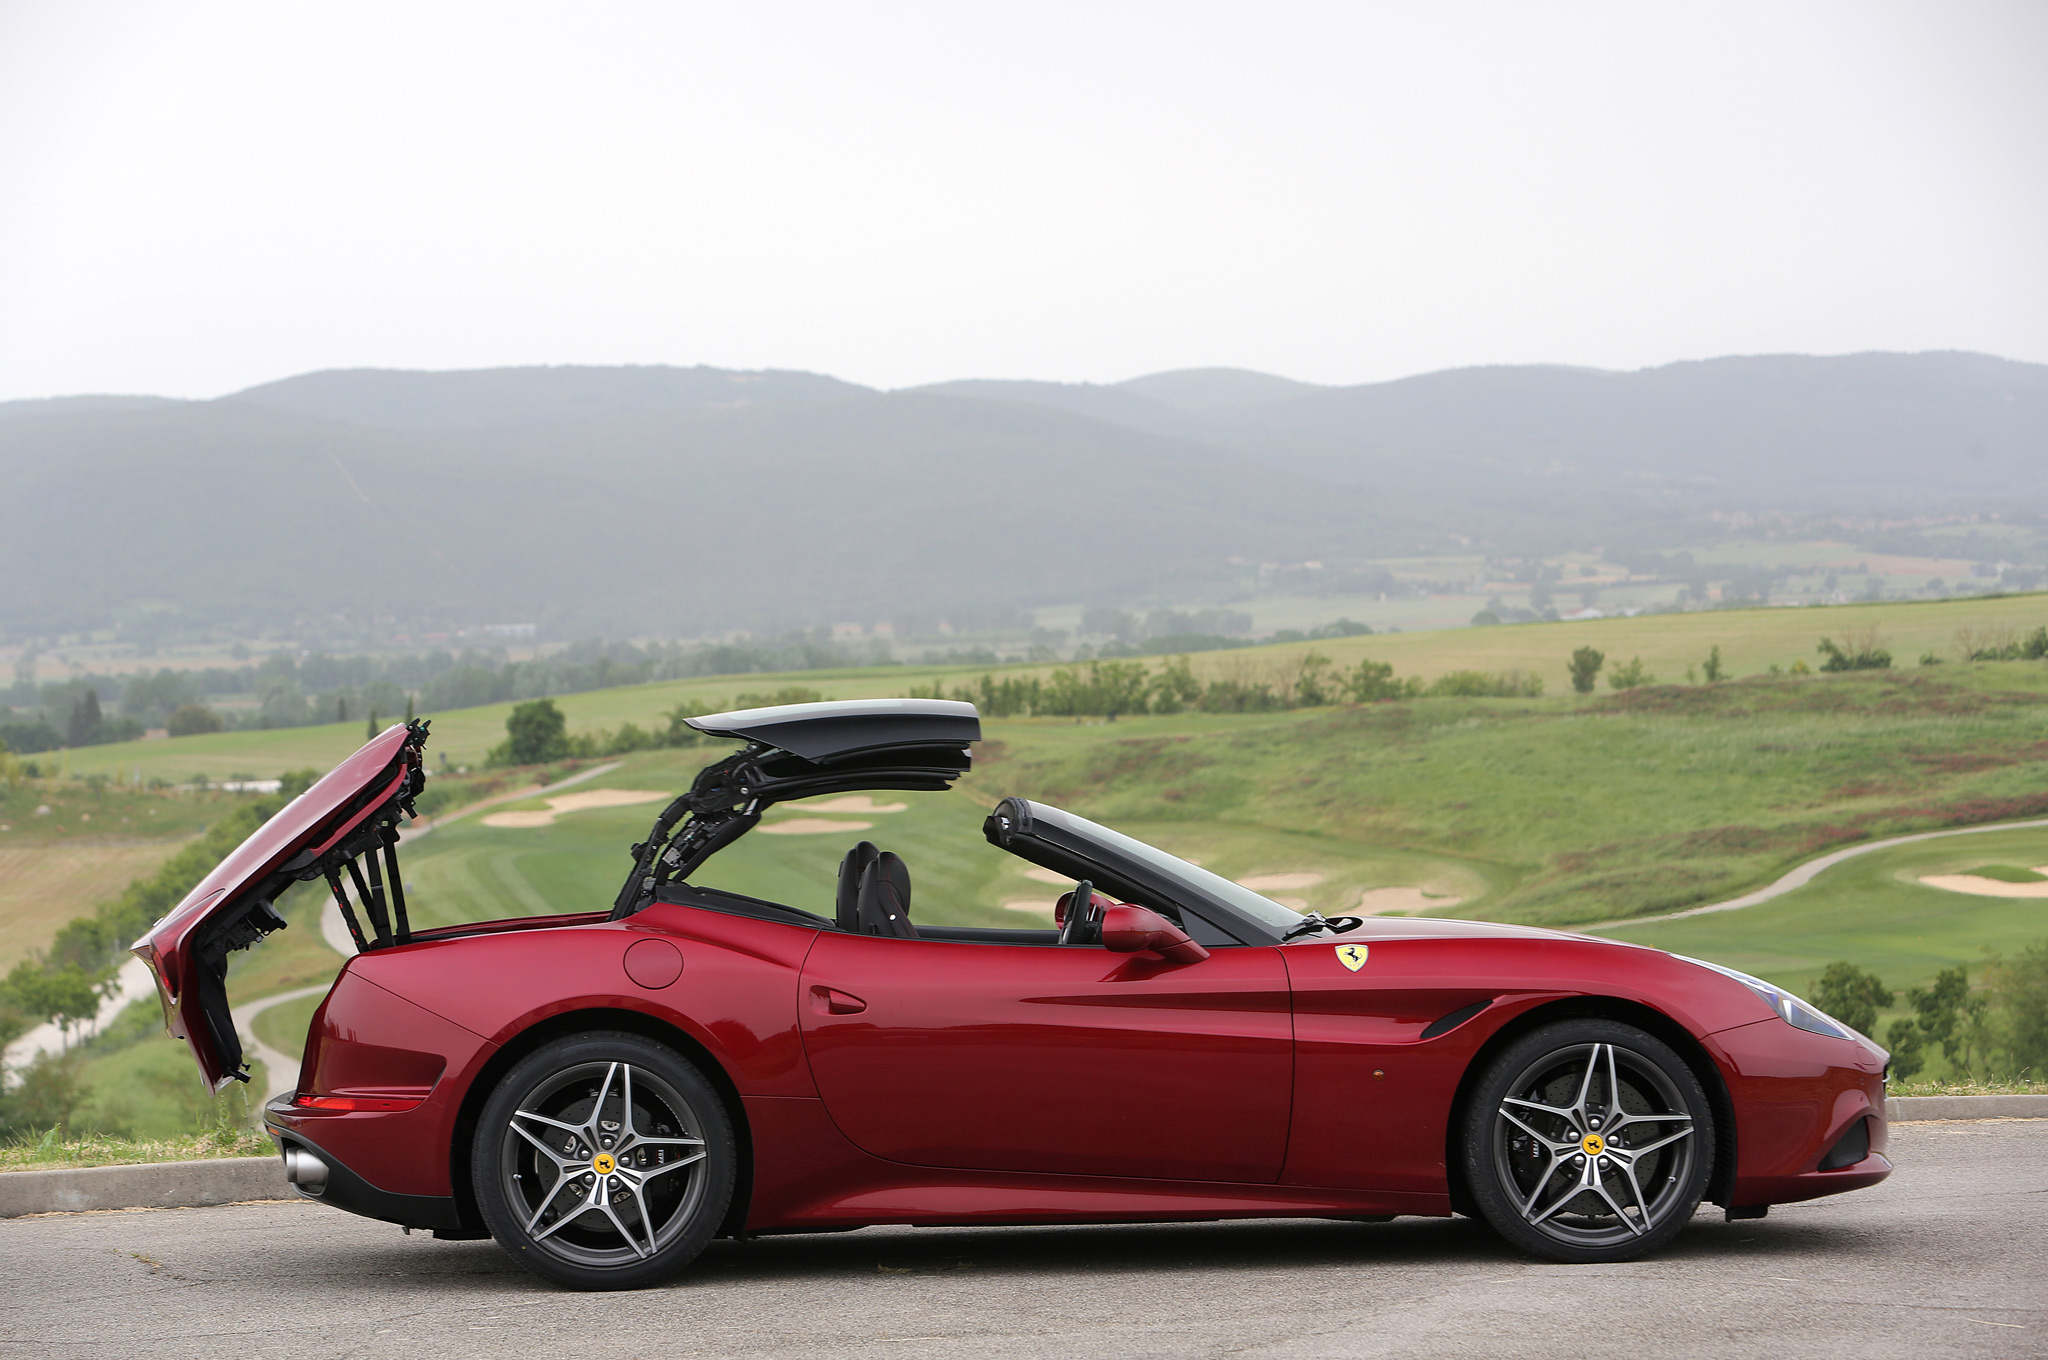 Side Preview: (Red) 2015 Ferrari California T